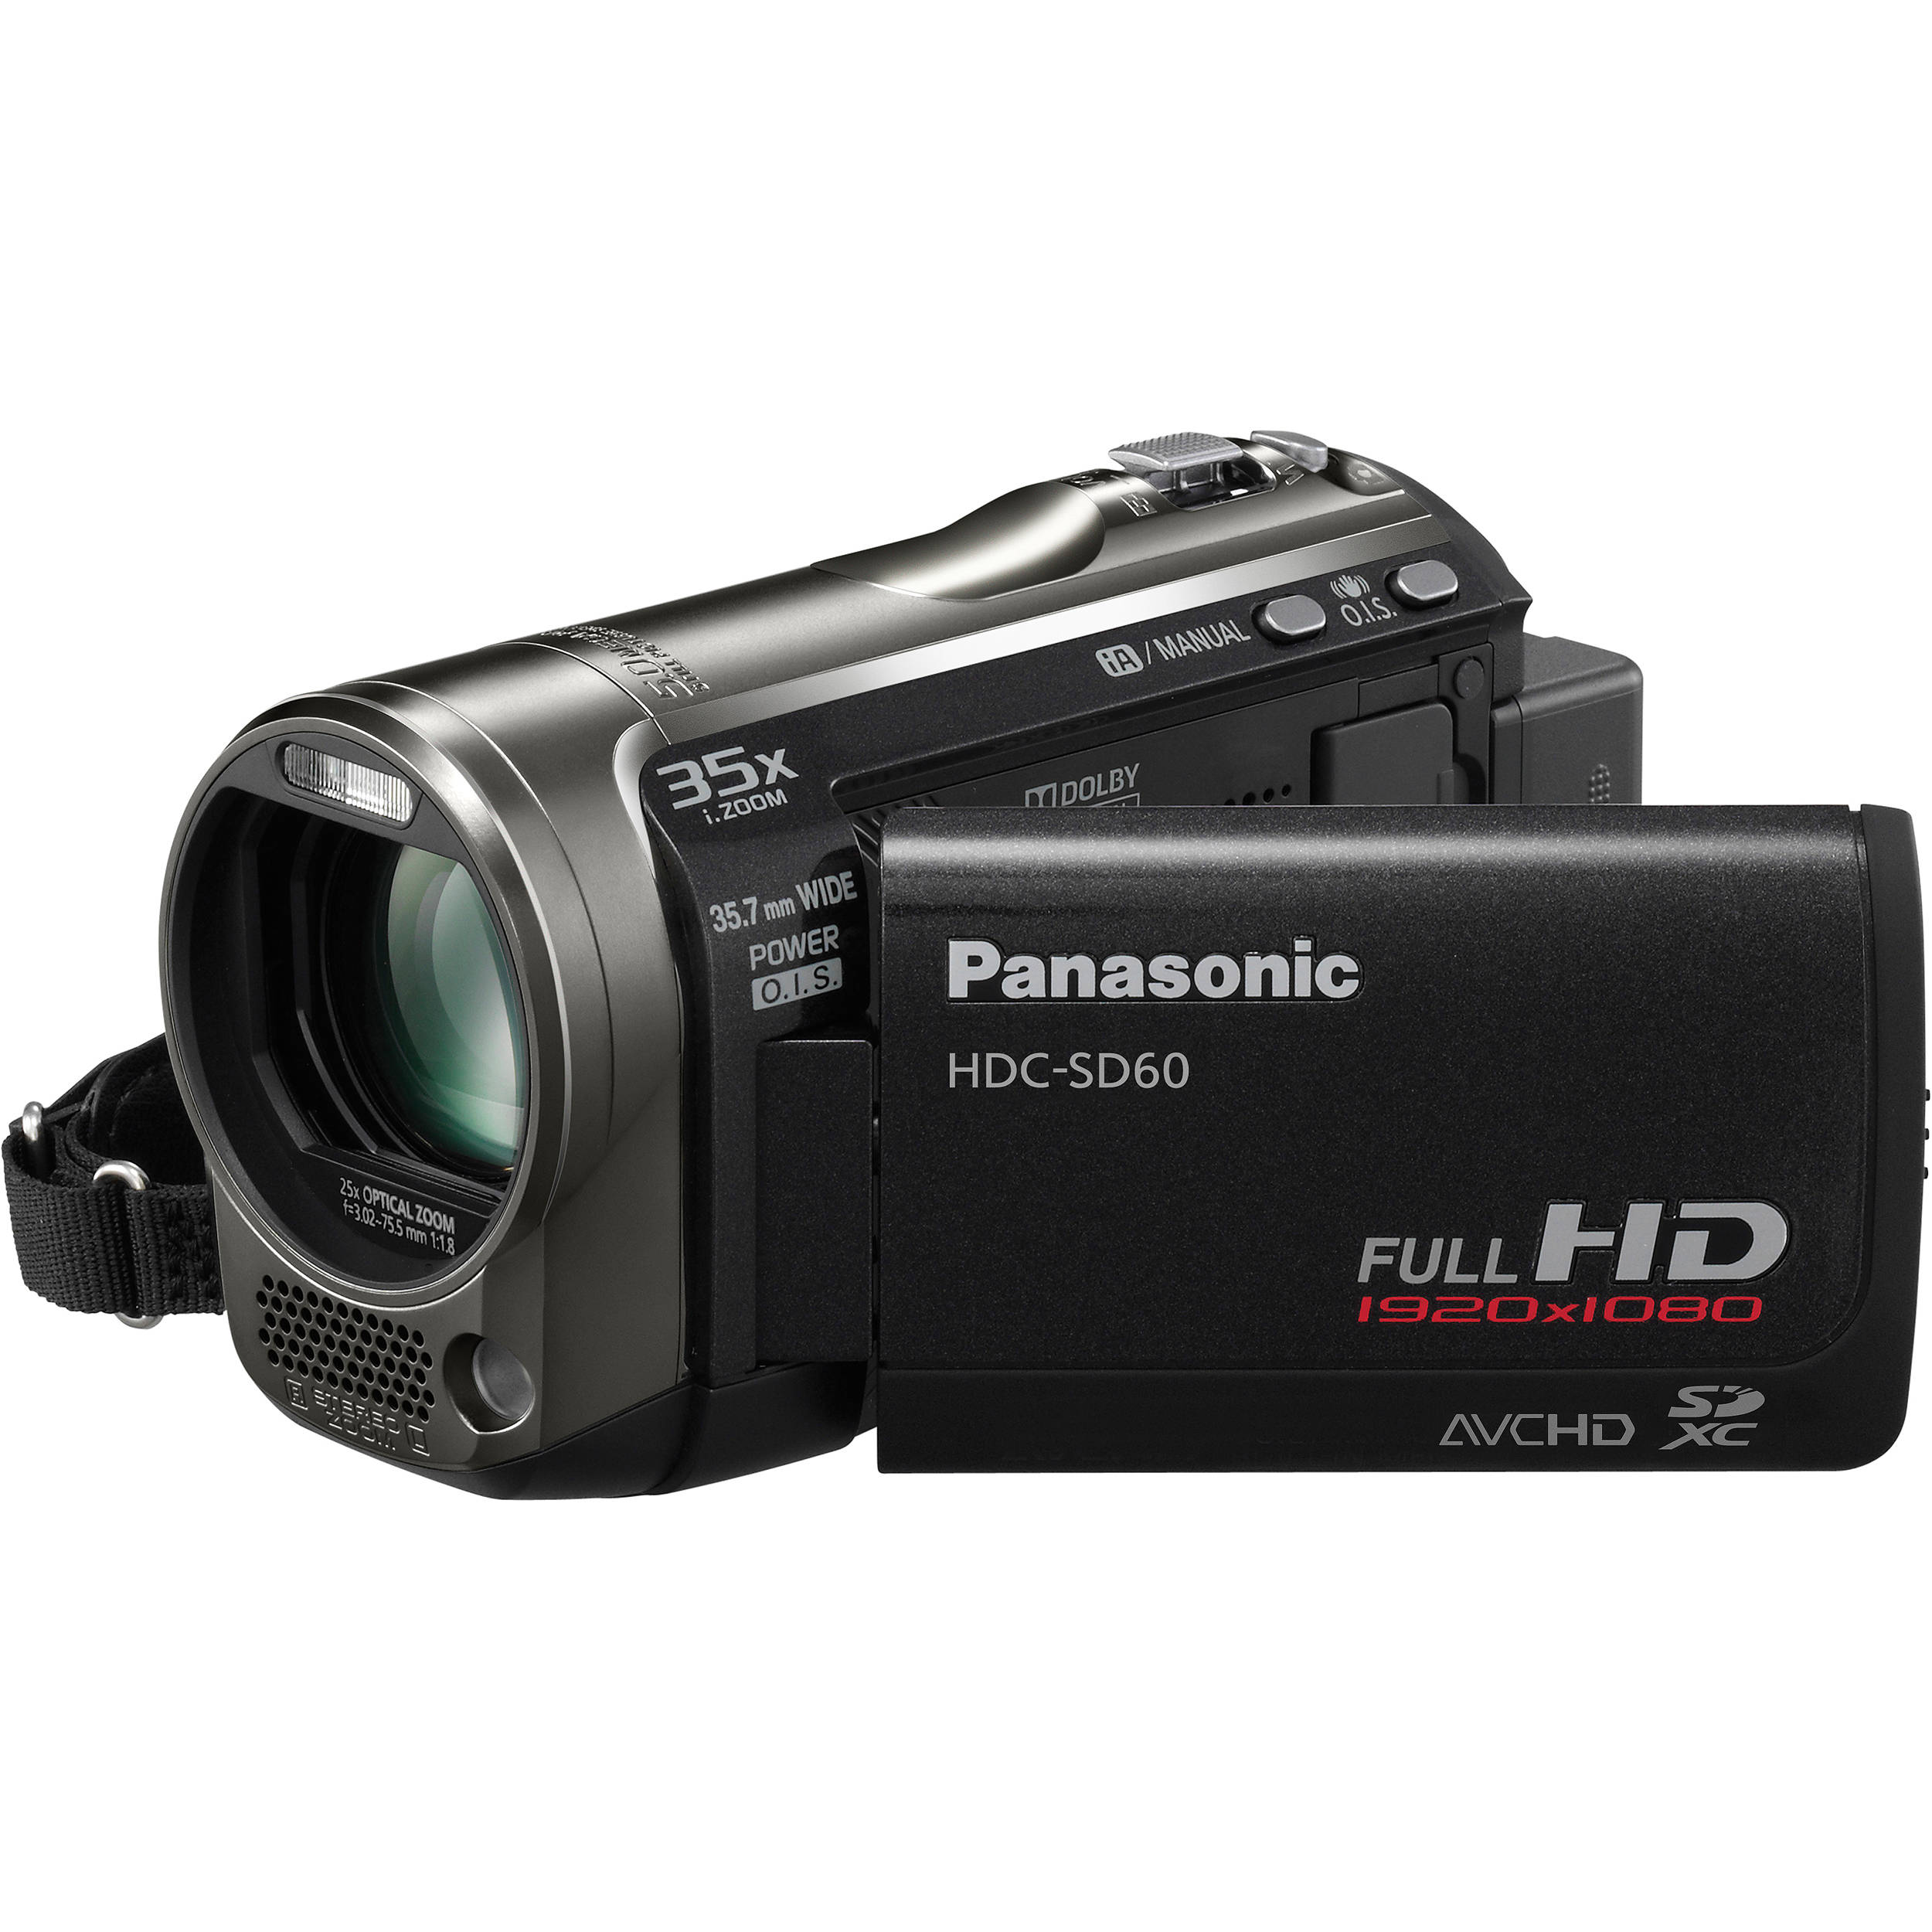 panasonic hdc sd60 high definition camcorder black hdc sd60k rh bhphotovideo com panasonic 3ccd video camera manual panasonic m7 vhs video camera manual